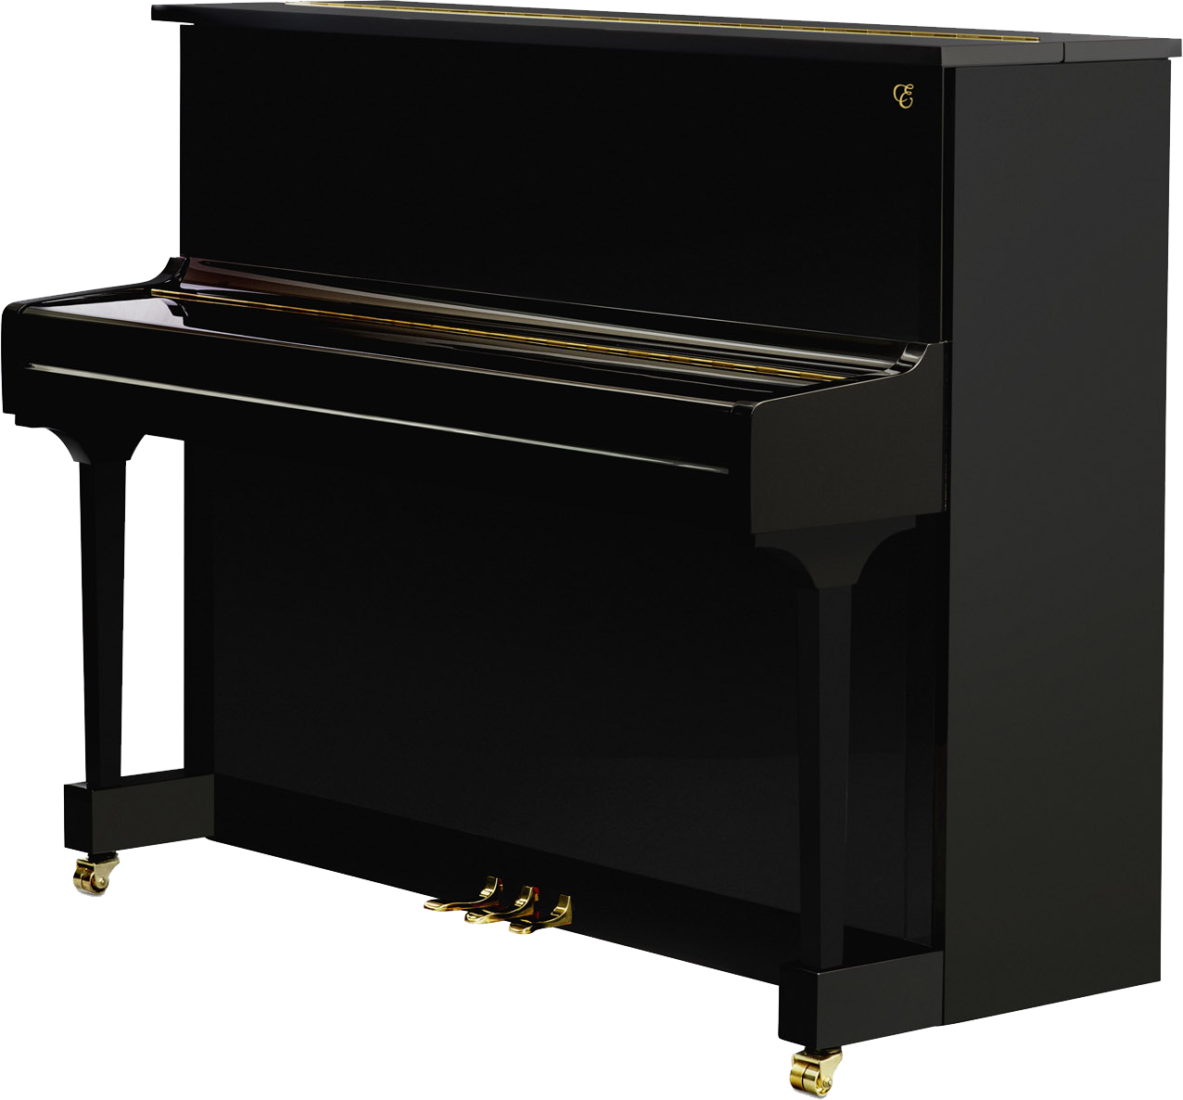 piano-vertical-essex-eup116-nuevo-negro-frontal-04